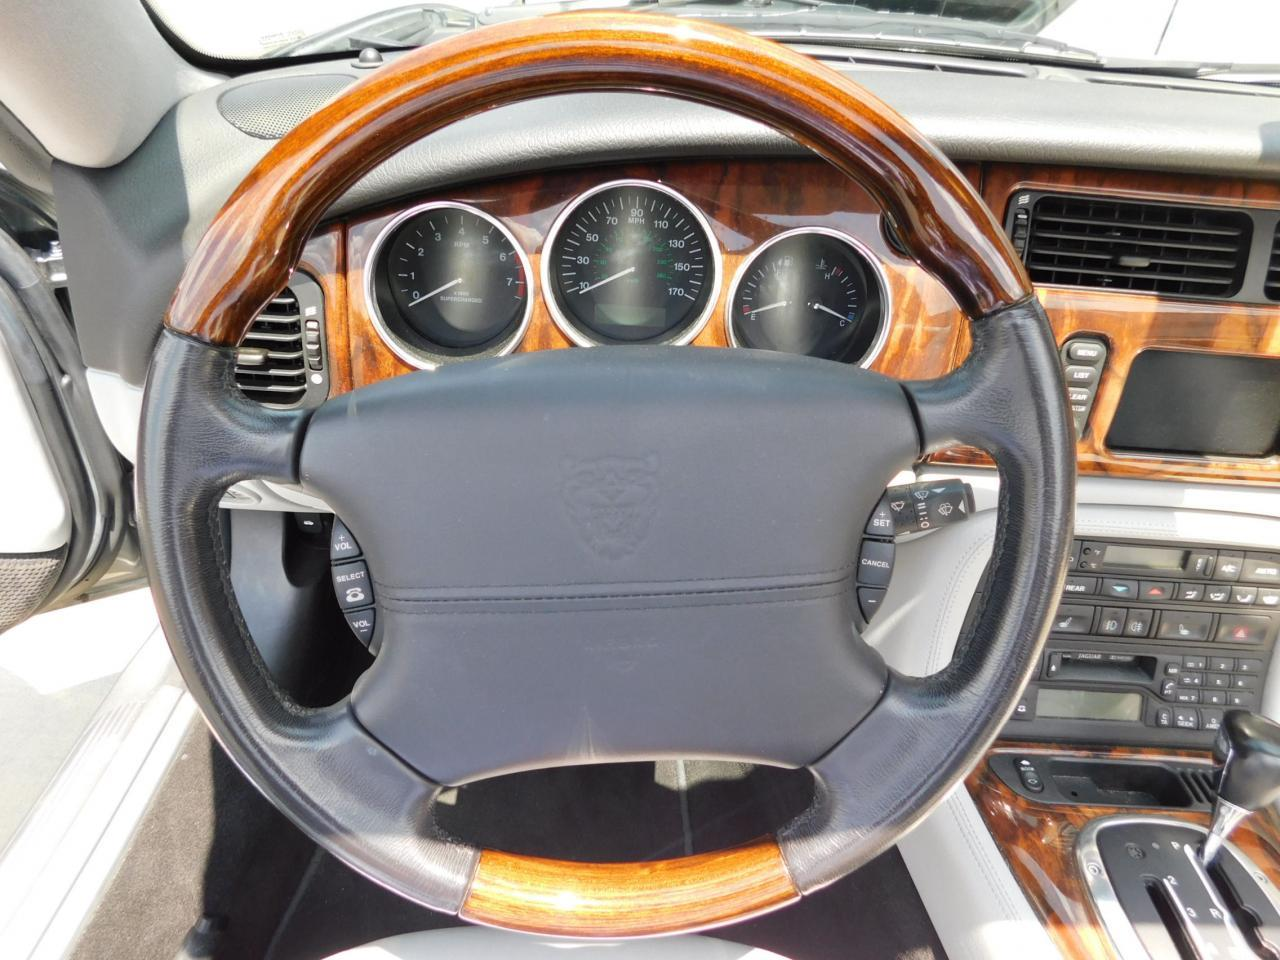 Large Picture of '05 Jaguar XKR located in Alpharetta Georgia - $19,595.00 - LGSX